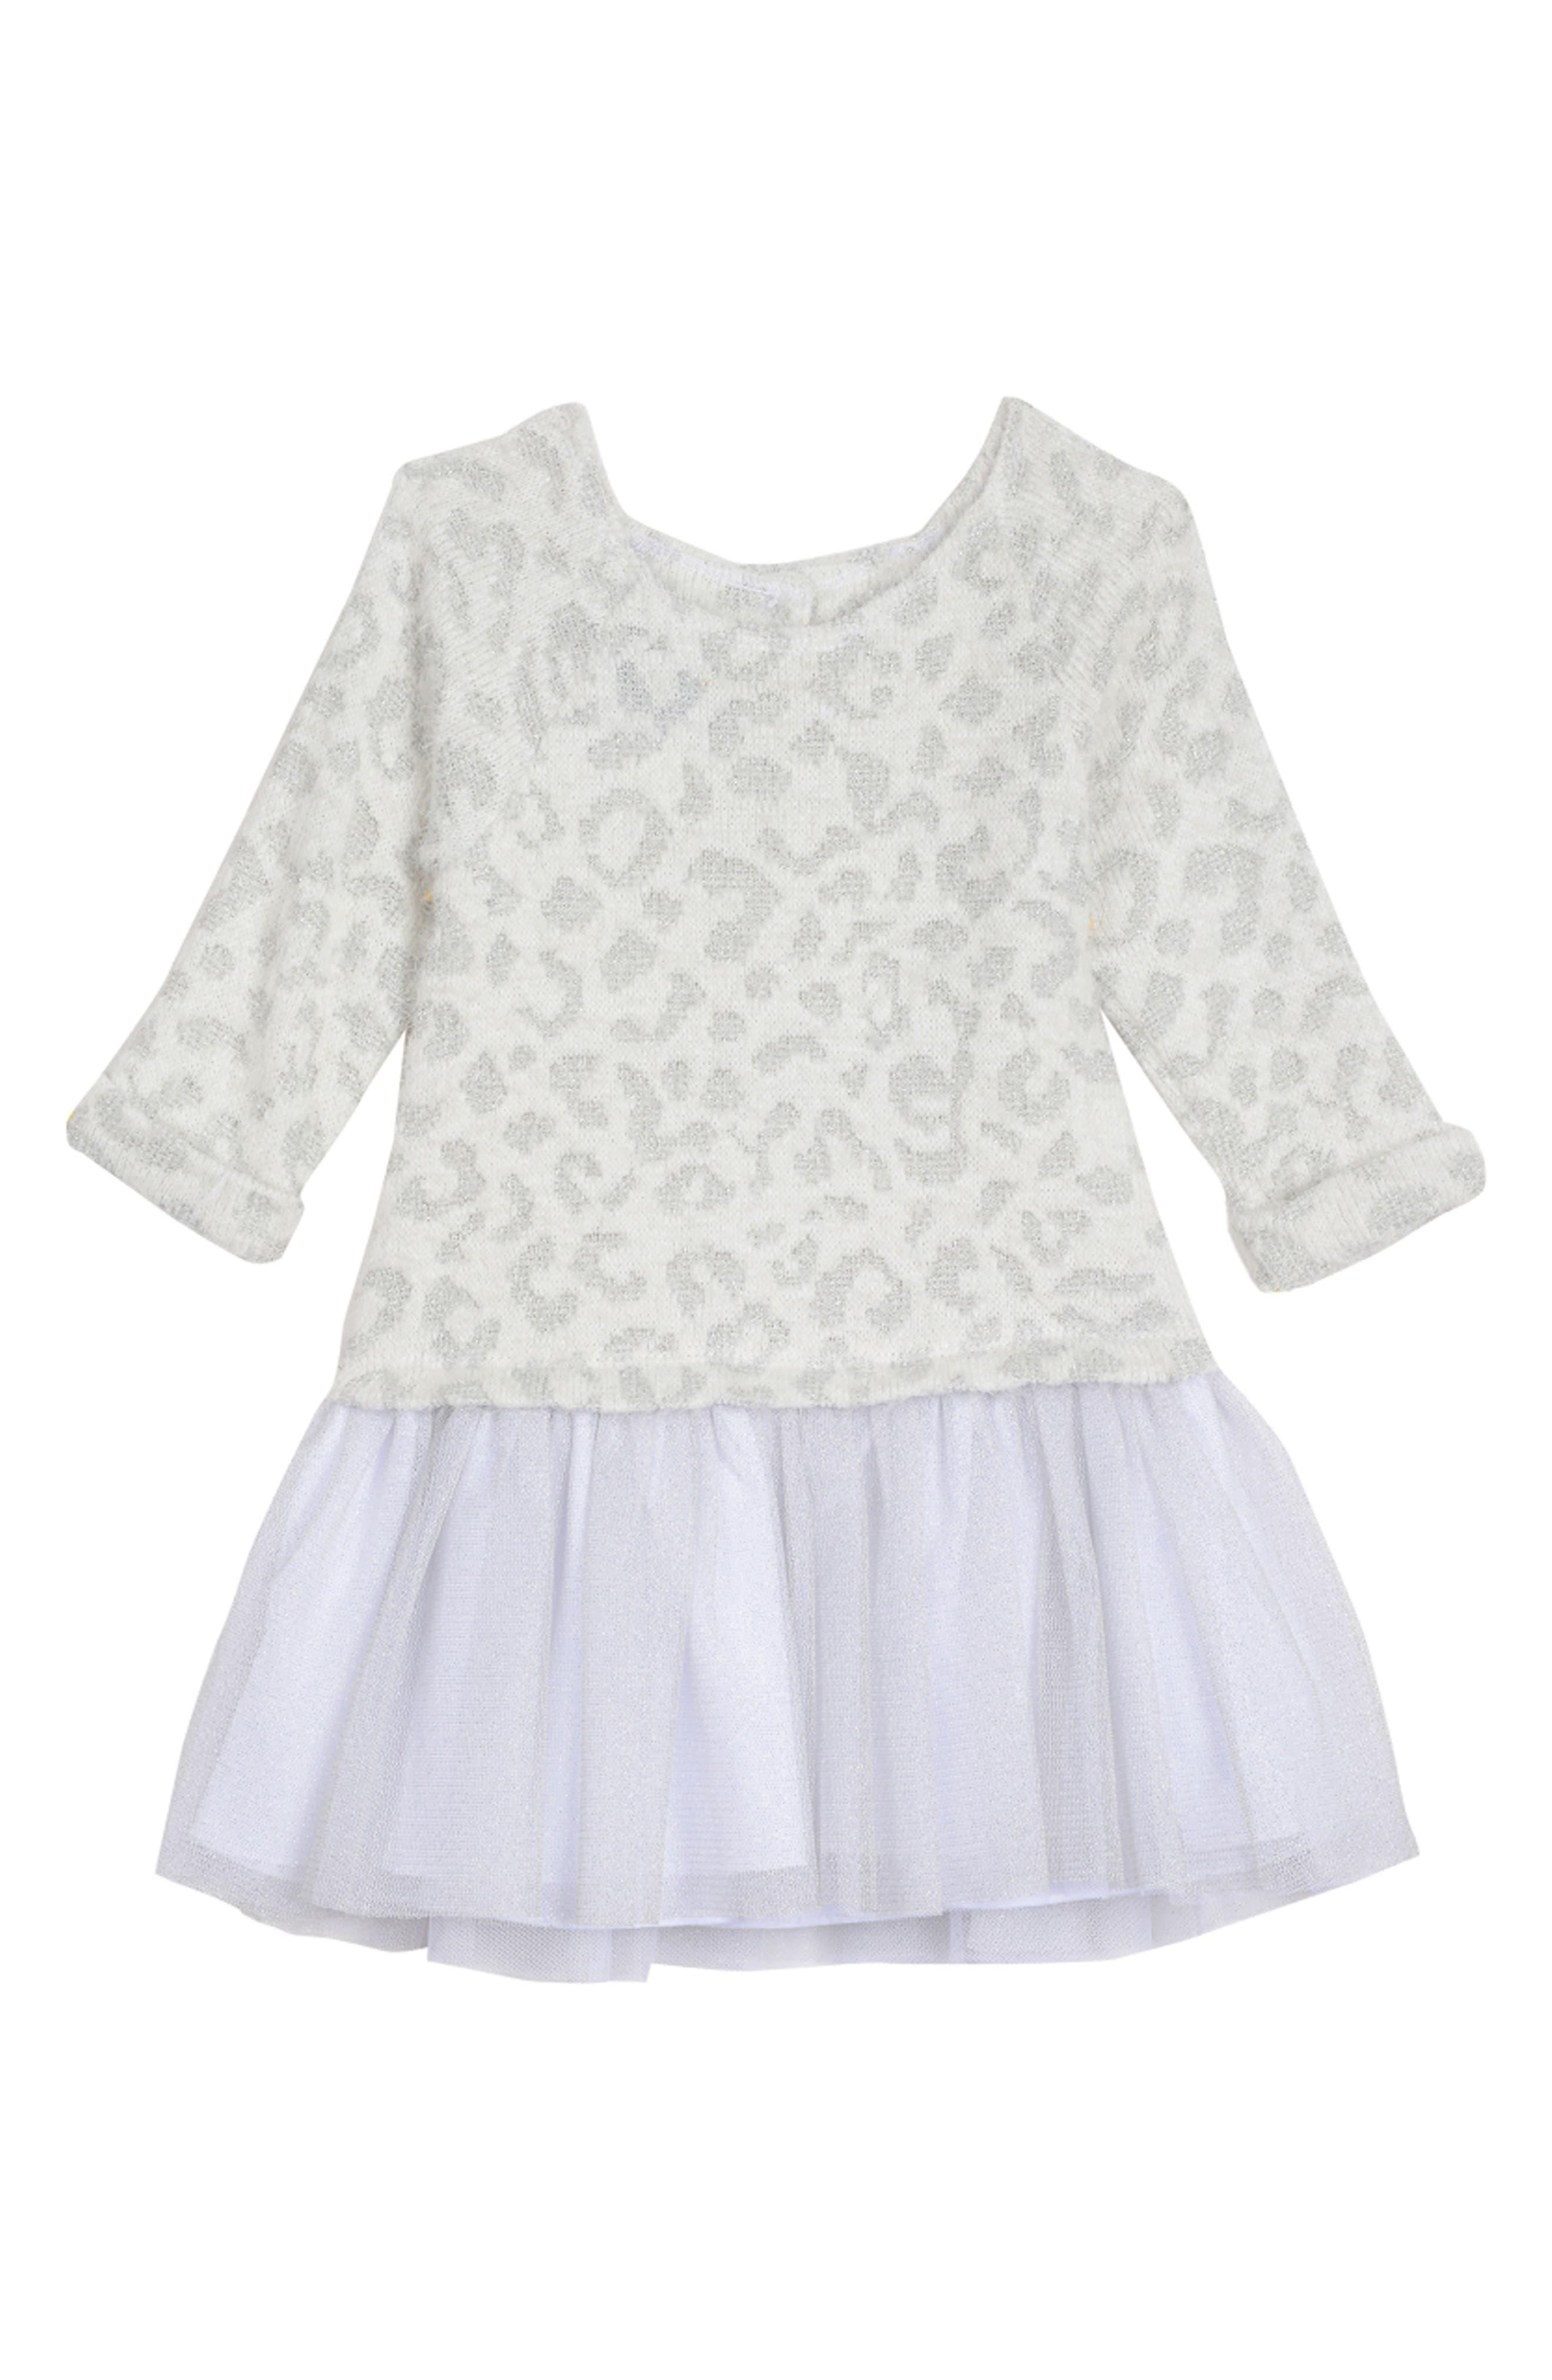 PIPPA & JULIE, Animal Pattern Sweater Dress, Main thumbnail 1, color, WHITE/ SILVER